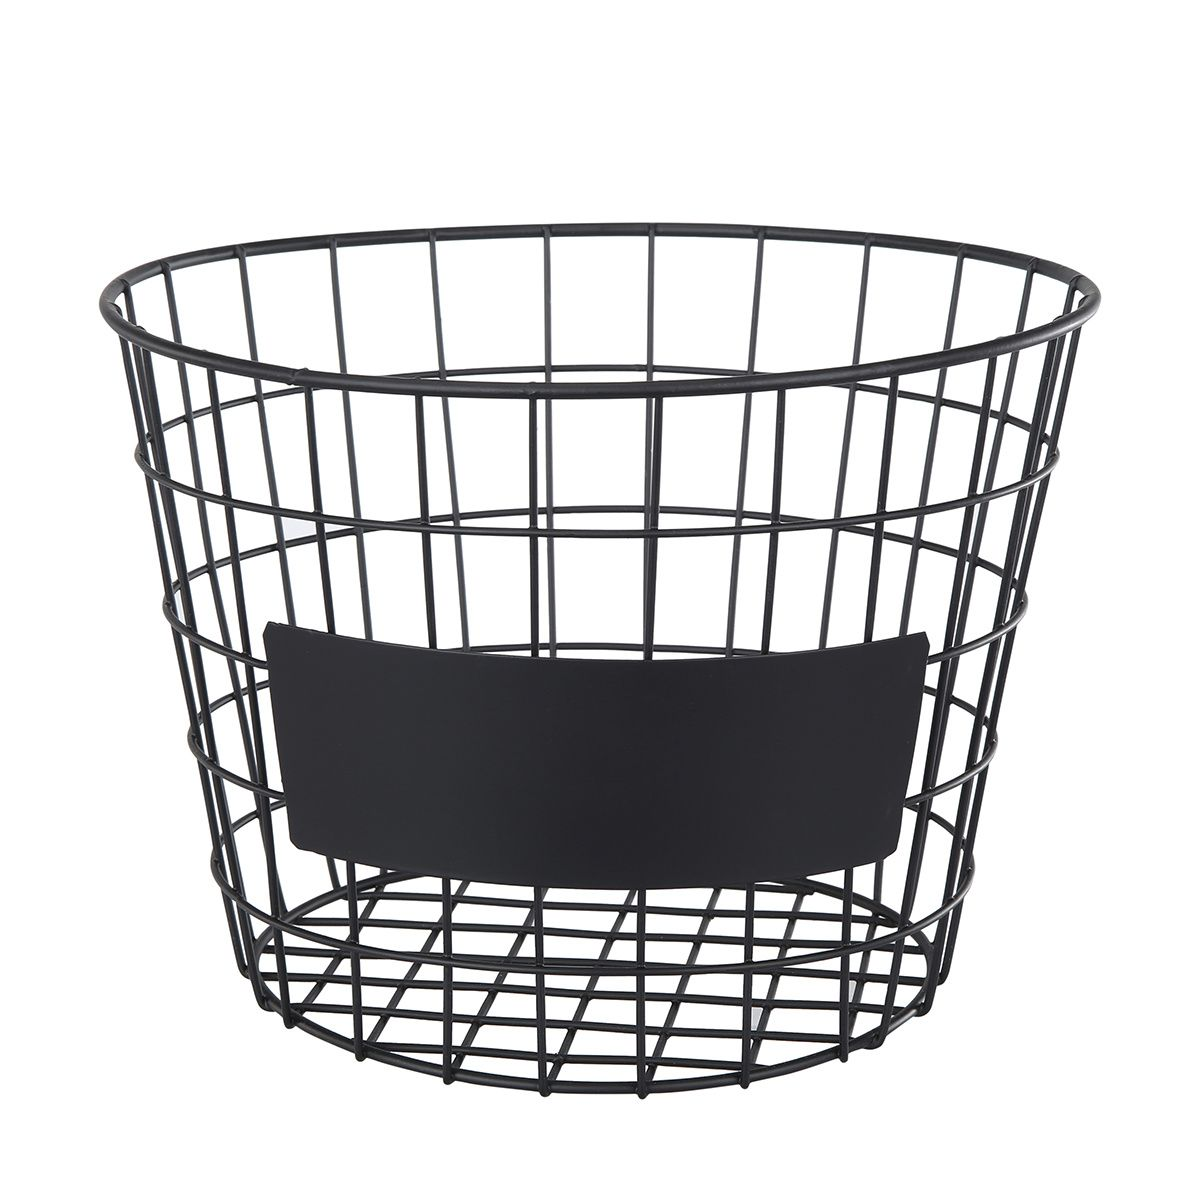 Round Blackboard Basket | Blackboards, Rounding and Pantry storage